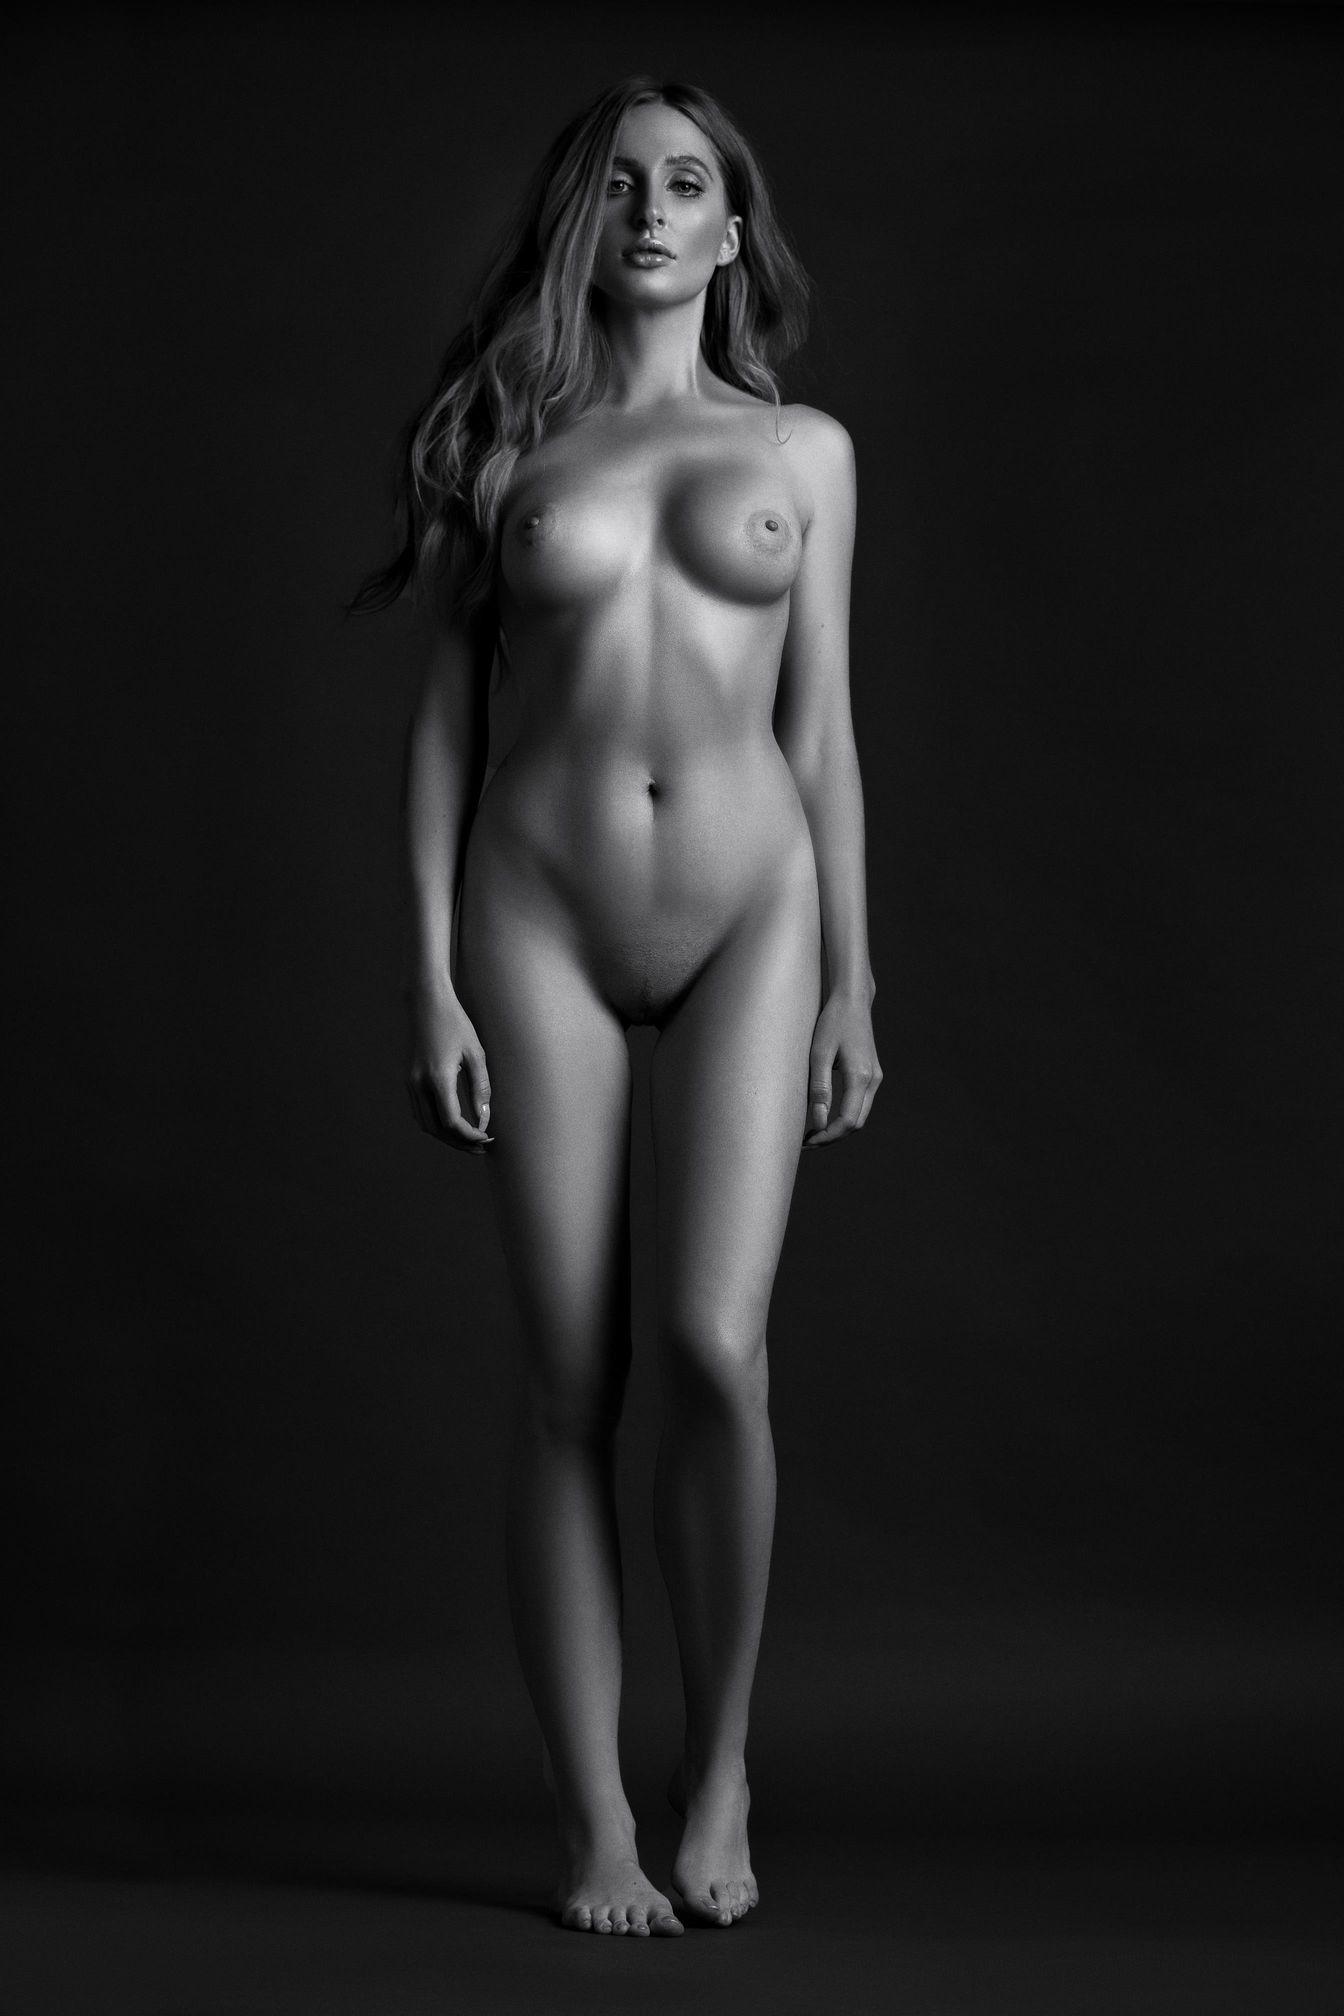 cameltoe Leaked Kate Grigorieva naked photo 2017